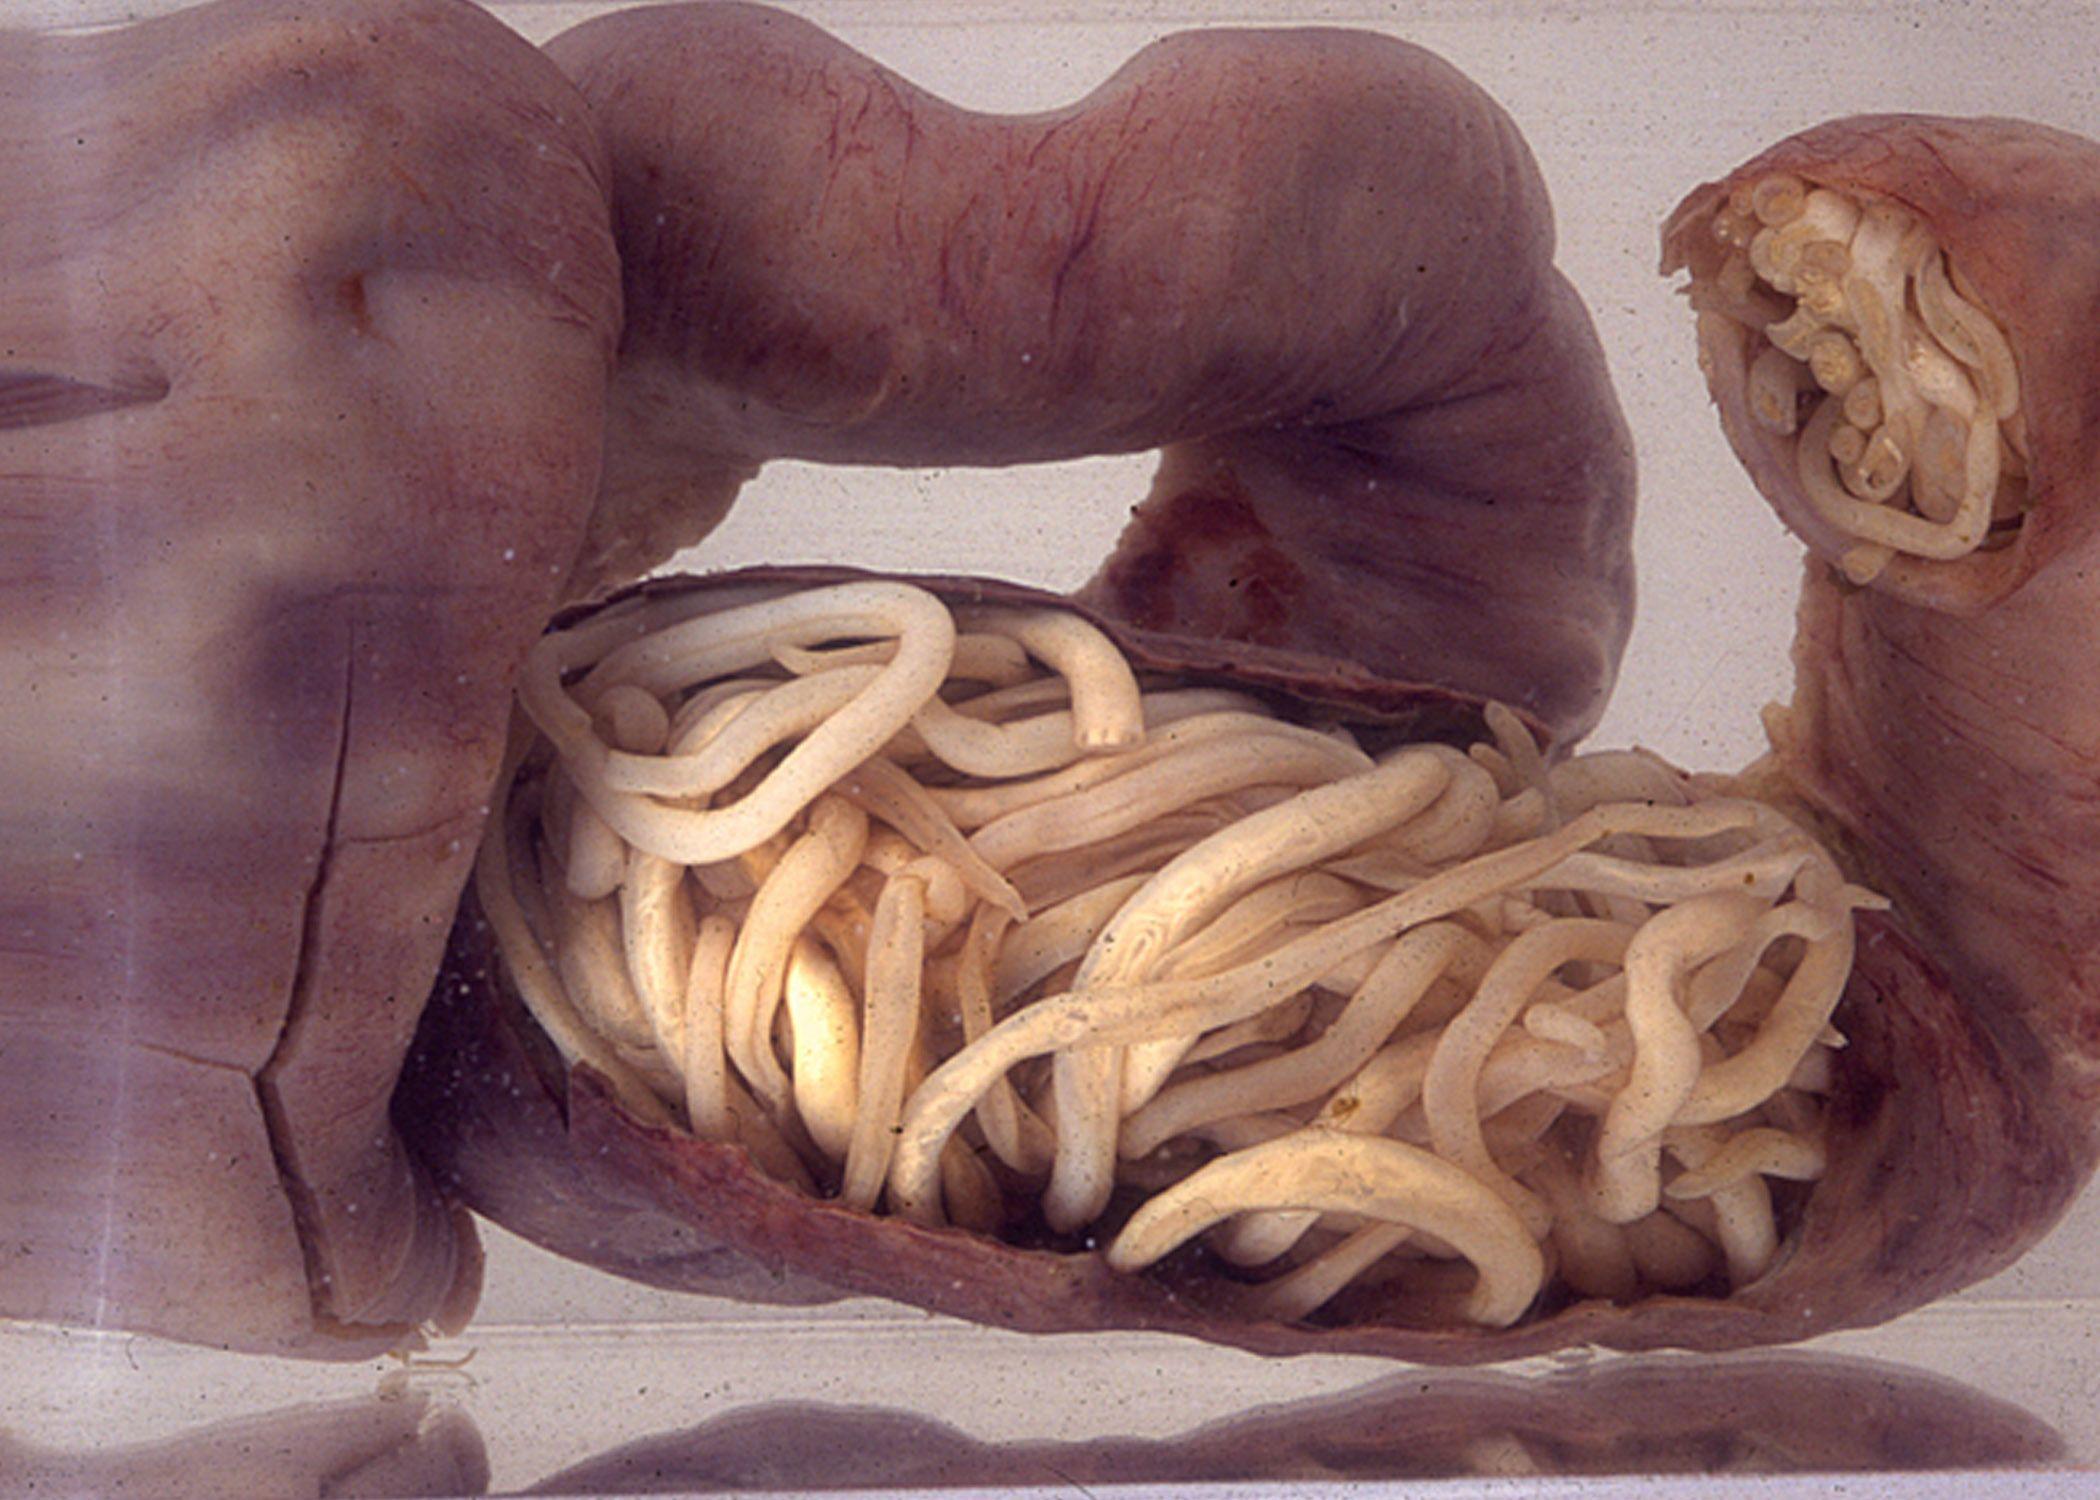 Ascaris worms